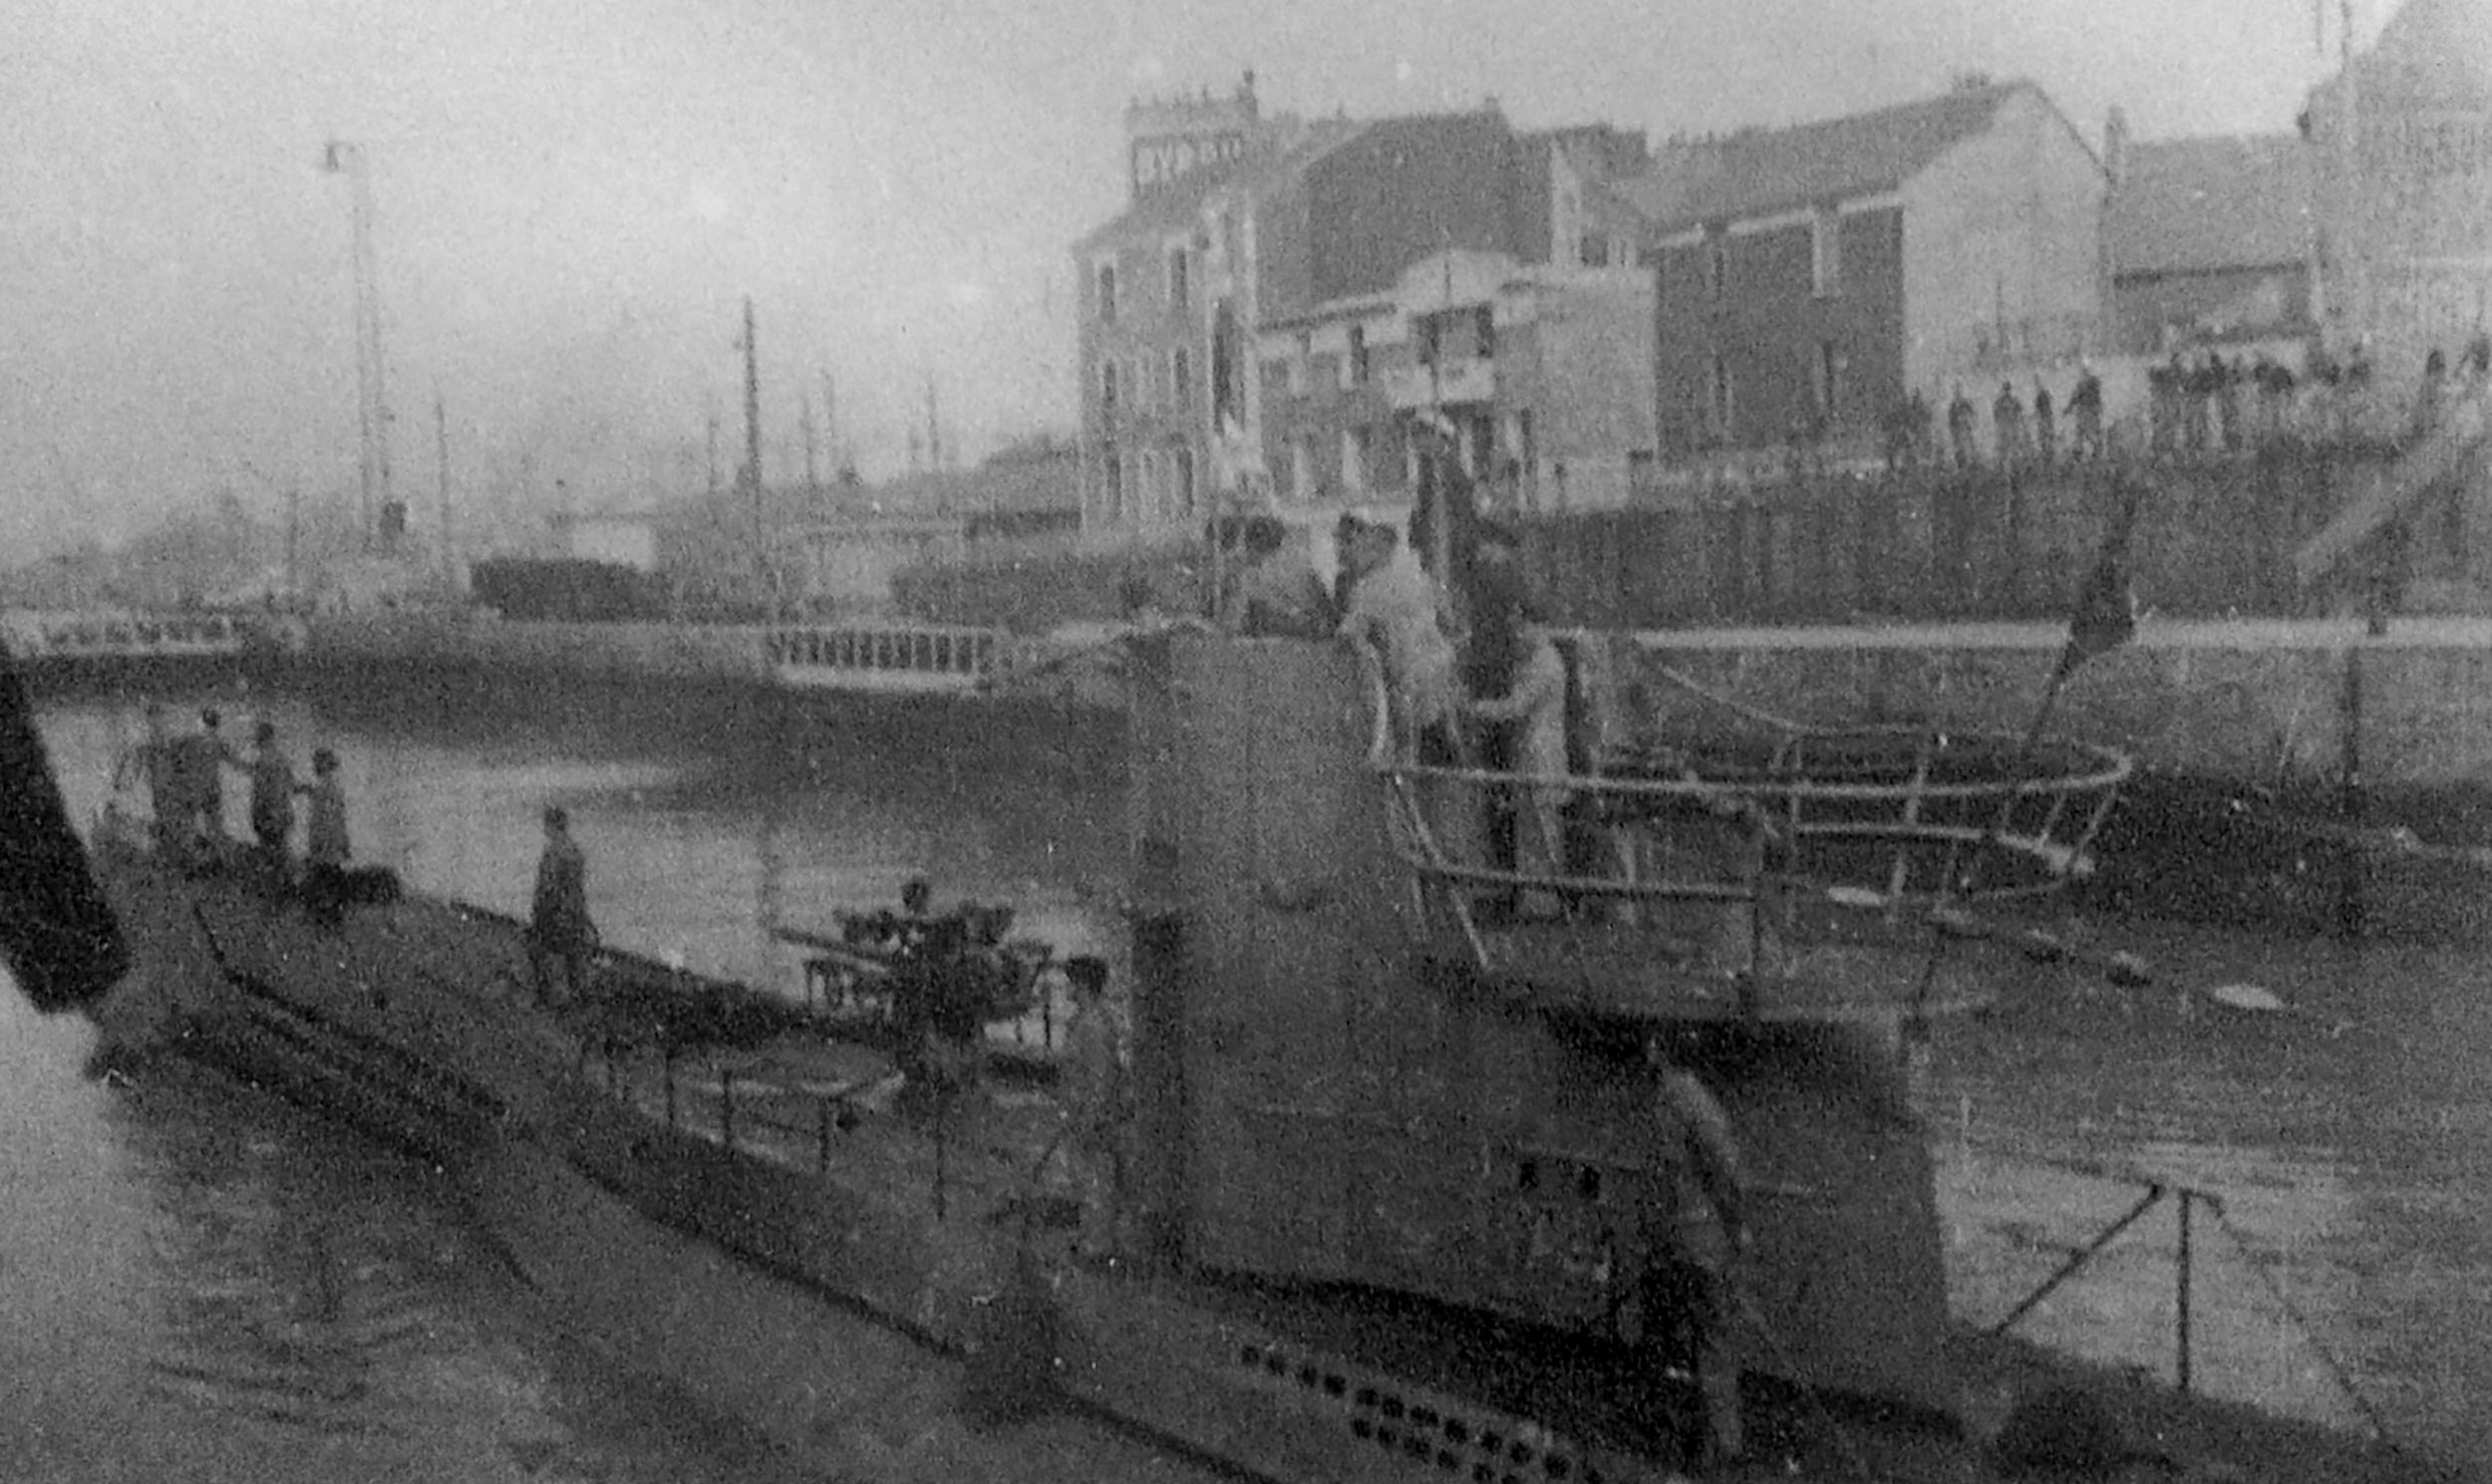 Archive Photos Show German U-Boat Crew on World War II Mission - NBC ...